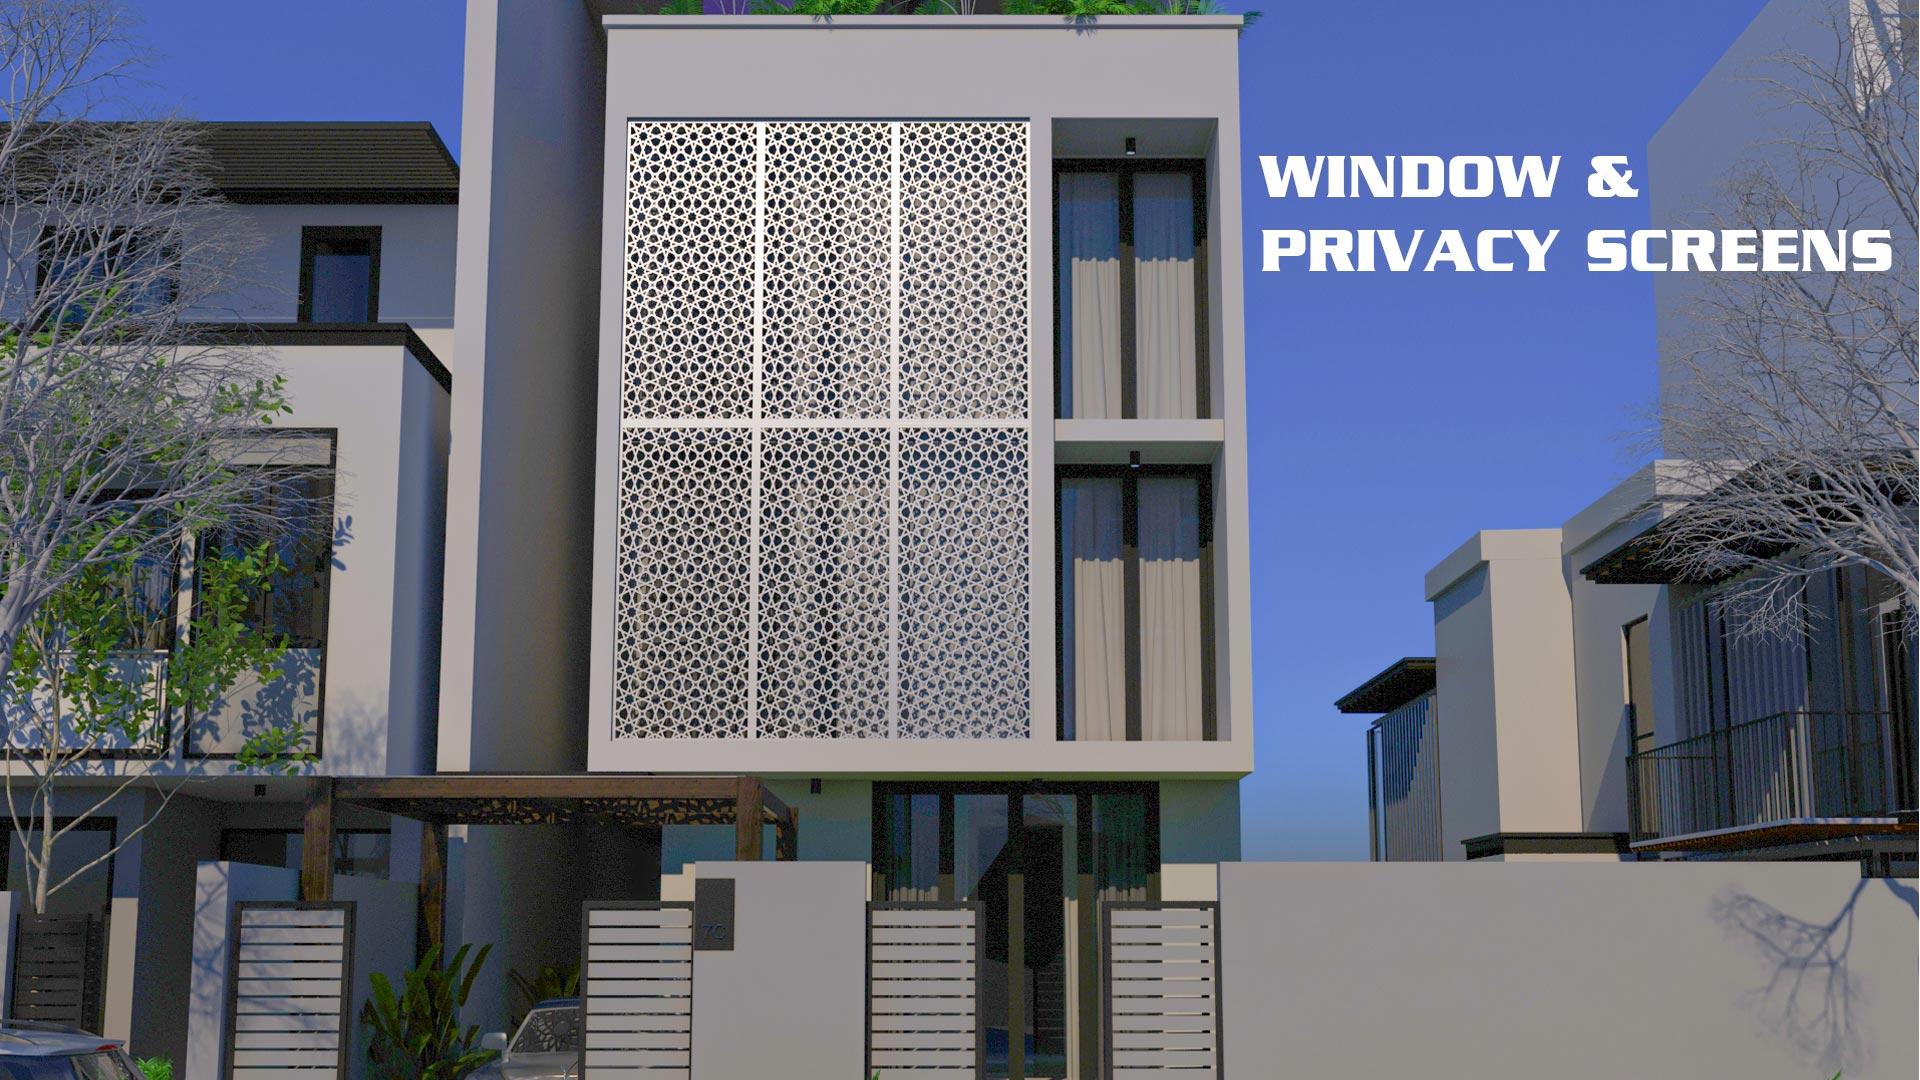 Window&privacy-carousel-inquiry